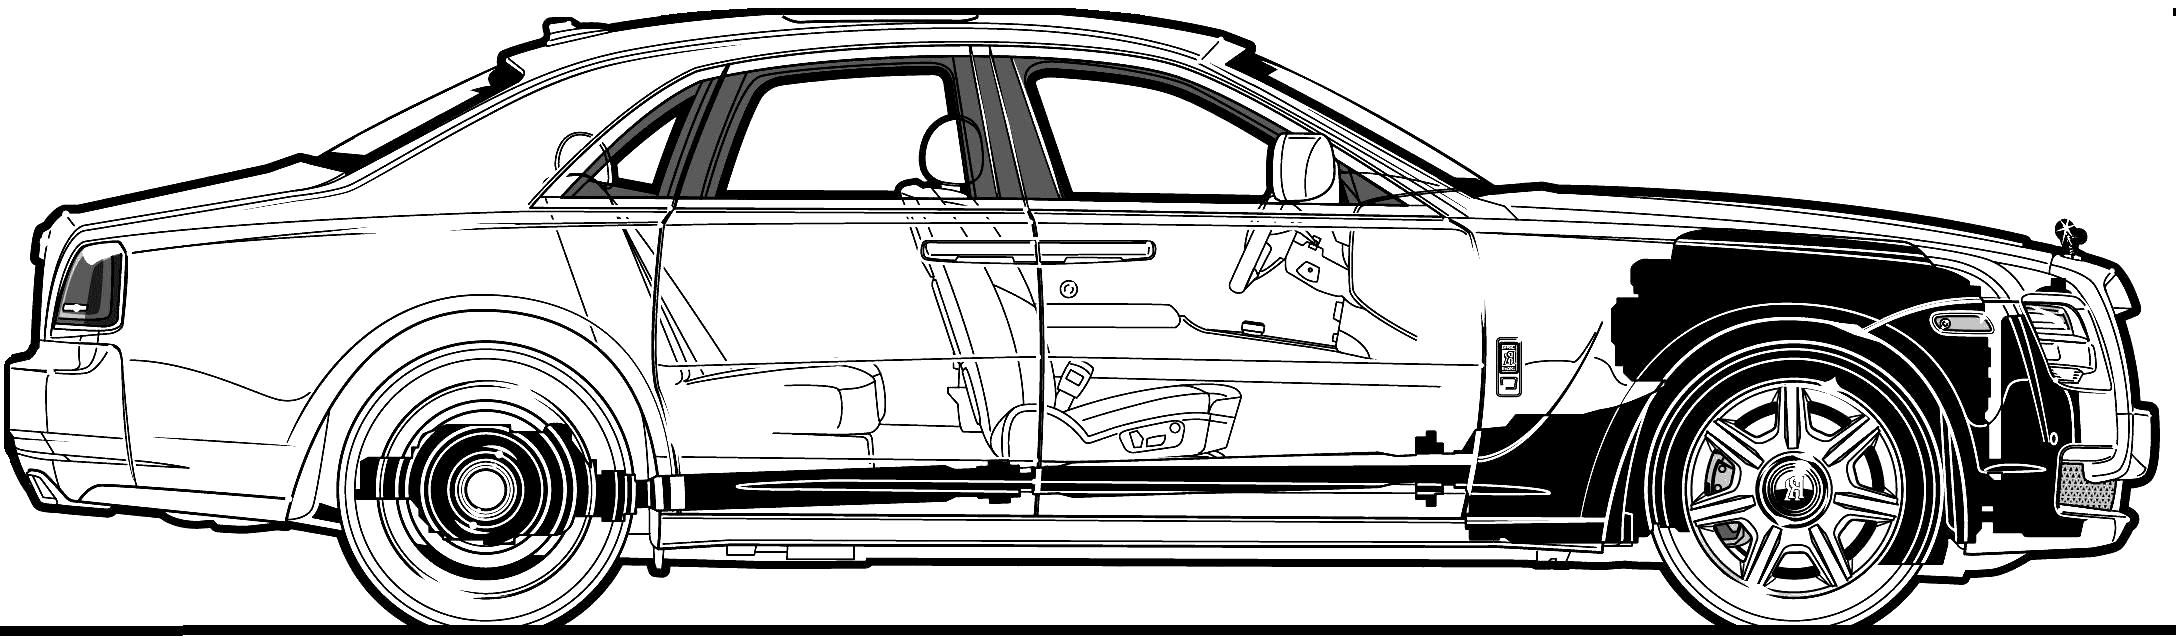 Car blueprints 2010 rolls royce ghost sedan blueprint 2010 rolls royce ghost sedan concept malvernweather Choice Image